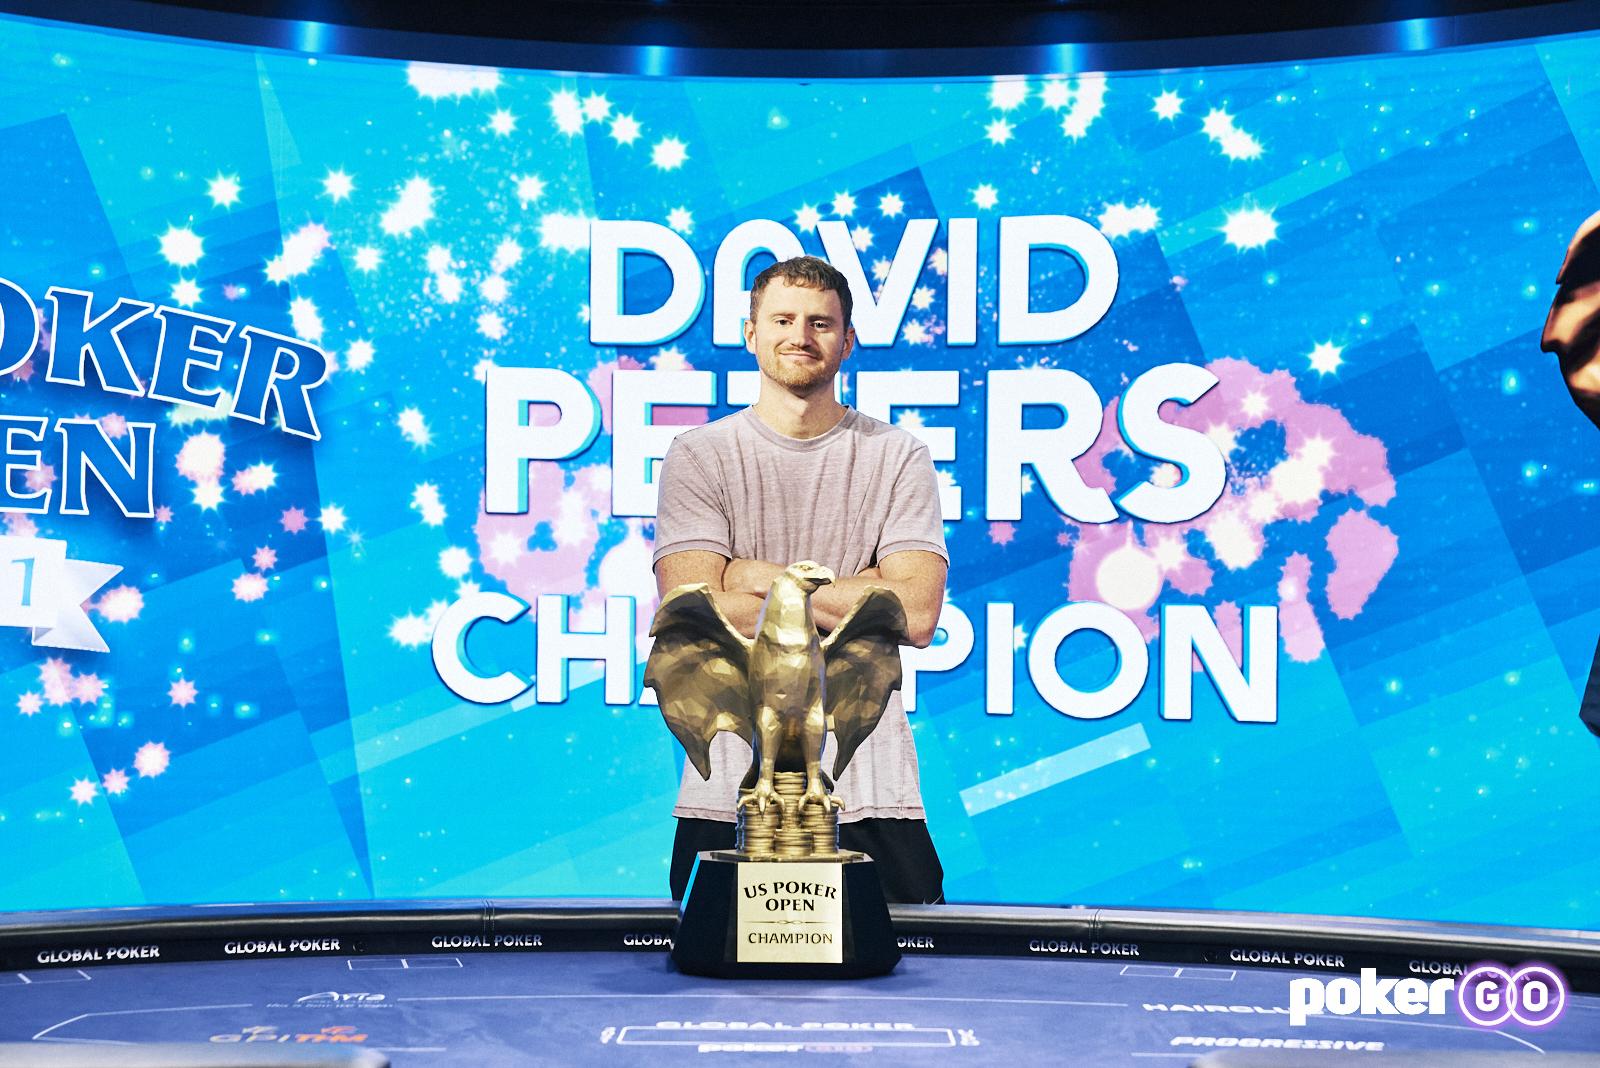 David Peters Wins Second Straight U.S. Poker Open Championship